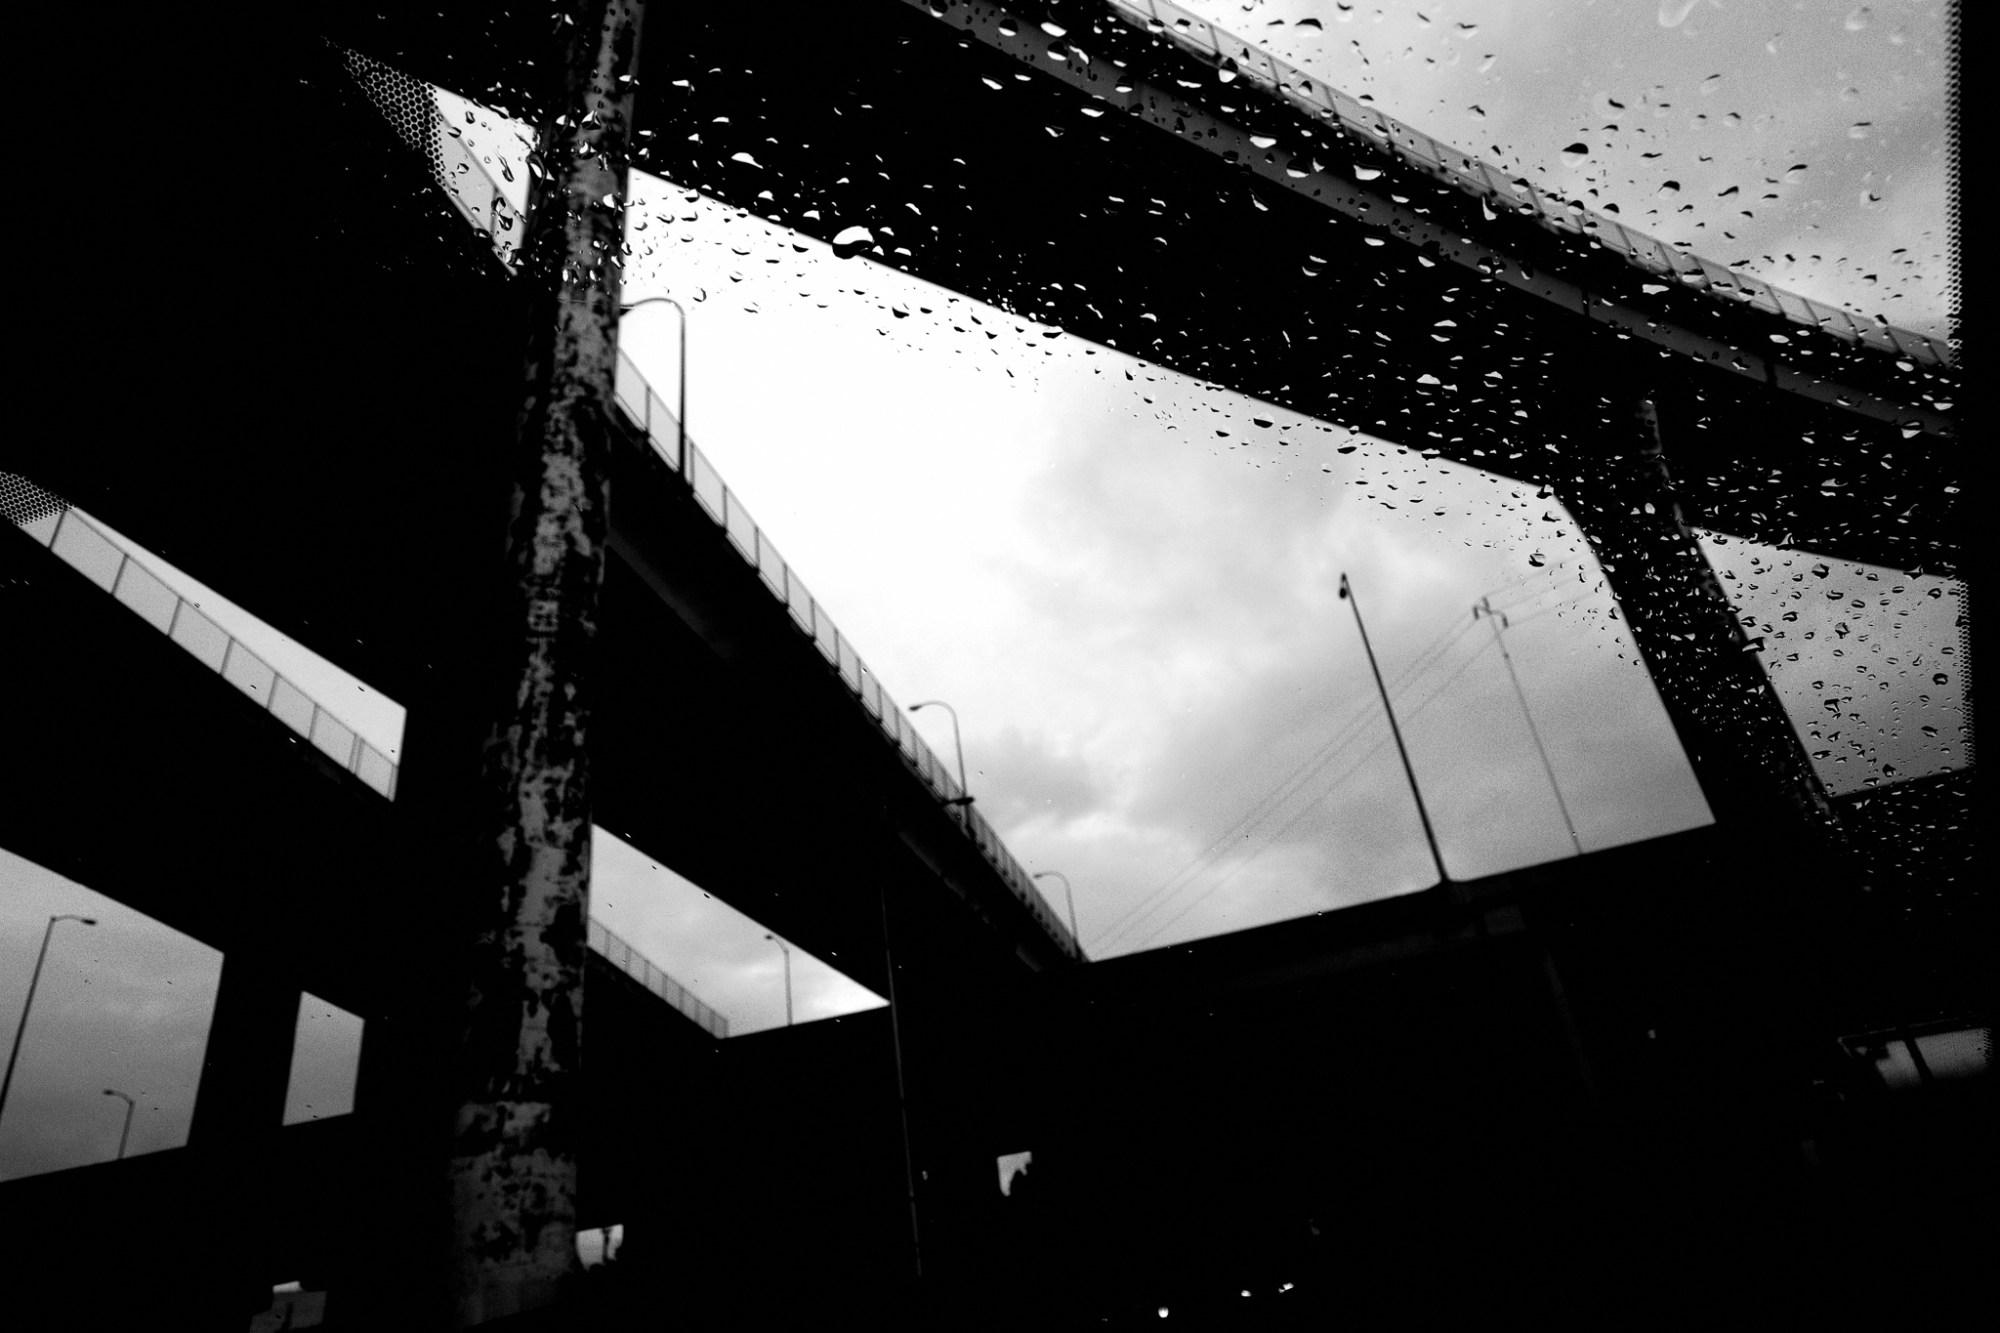 Freeway highway